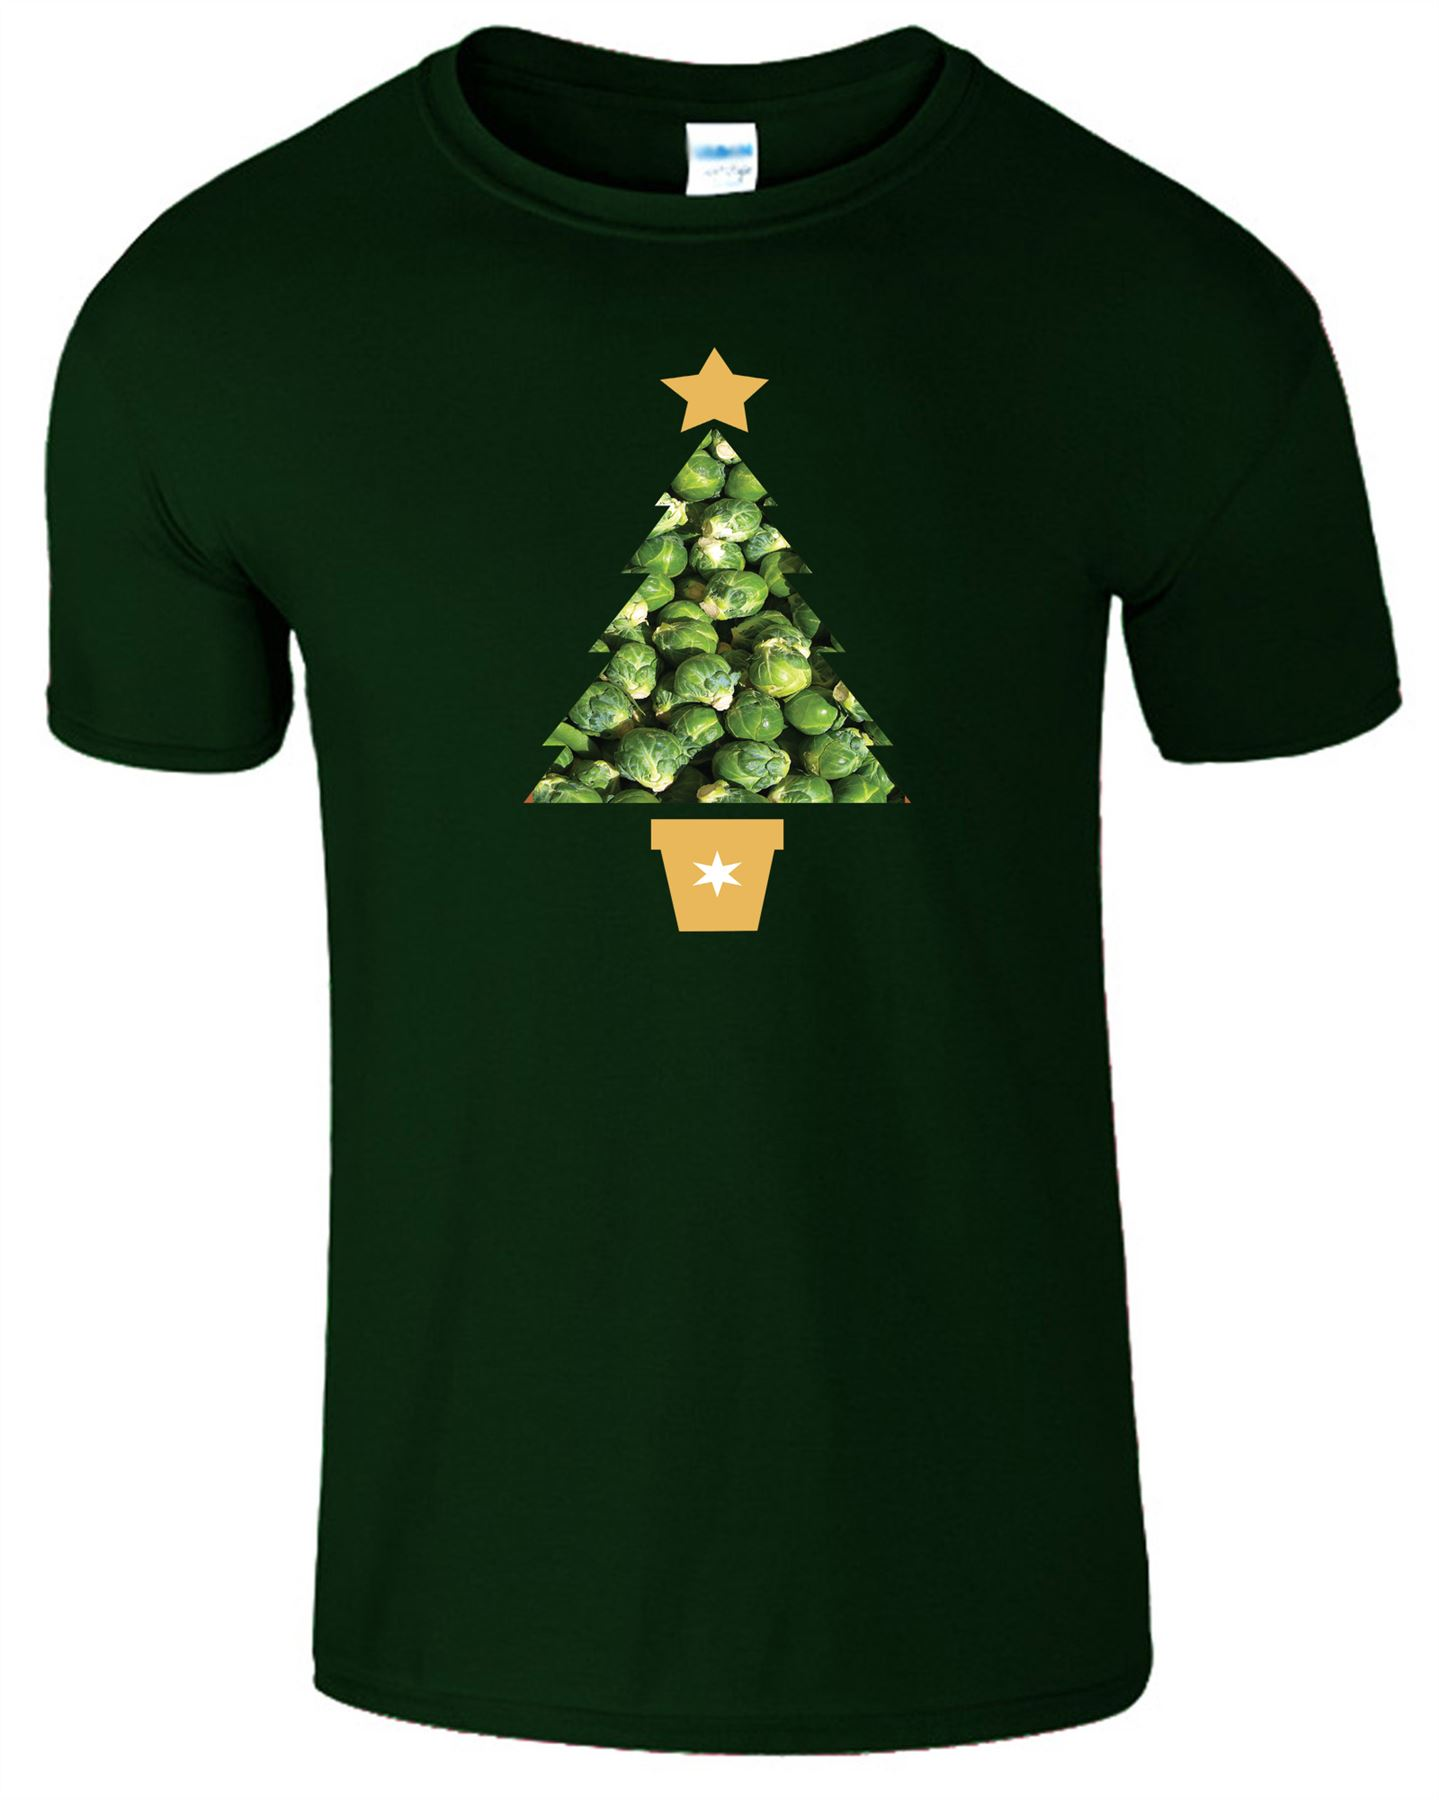 CHRISTMAS TREE SPROUTS Mens Funny T-Shirt Festive Novelty Xmas Kids Top Tshirt